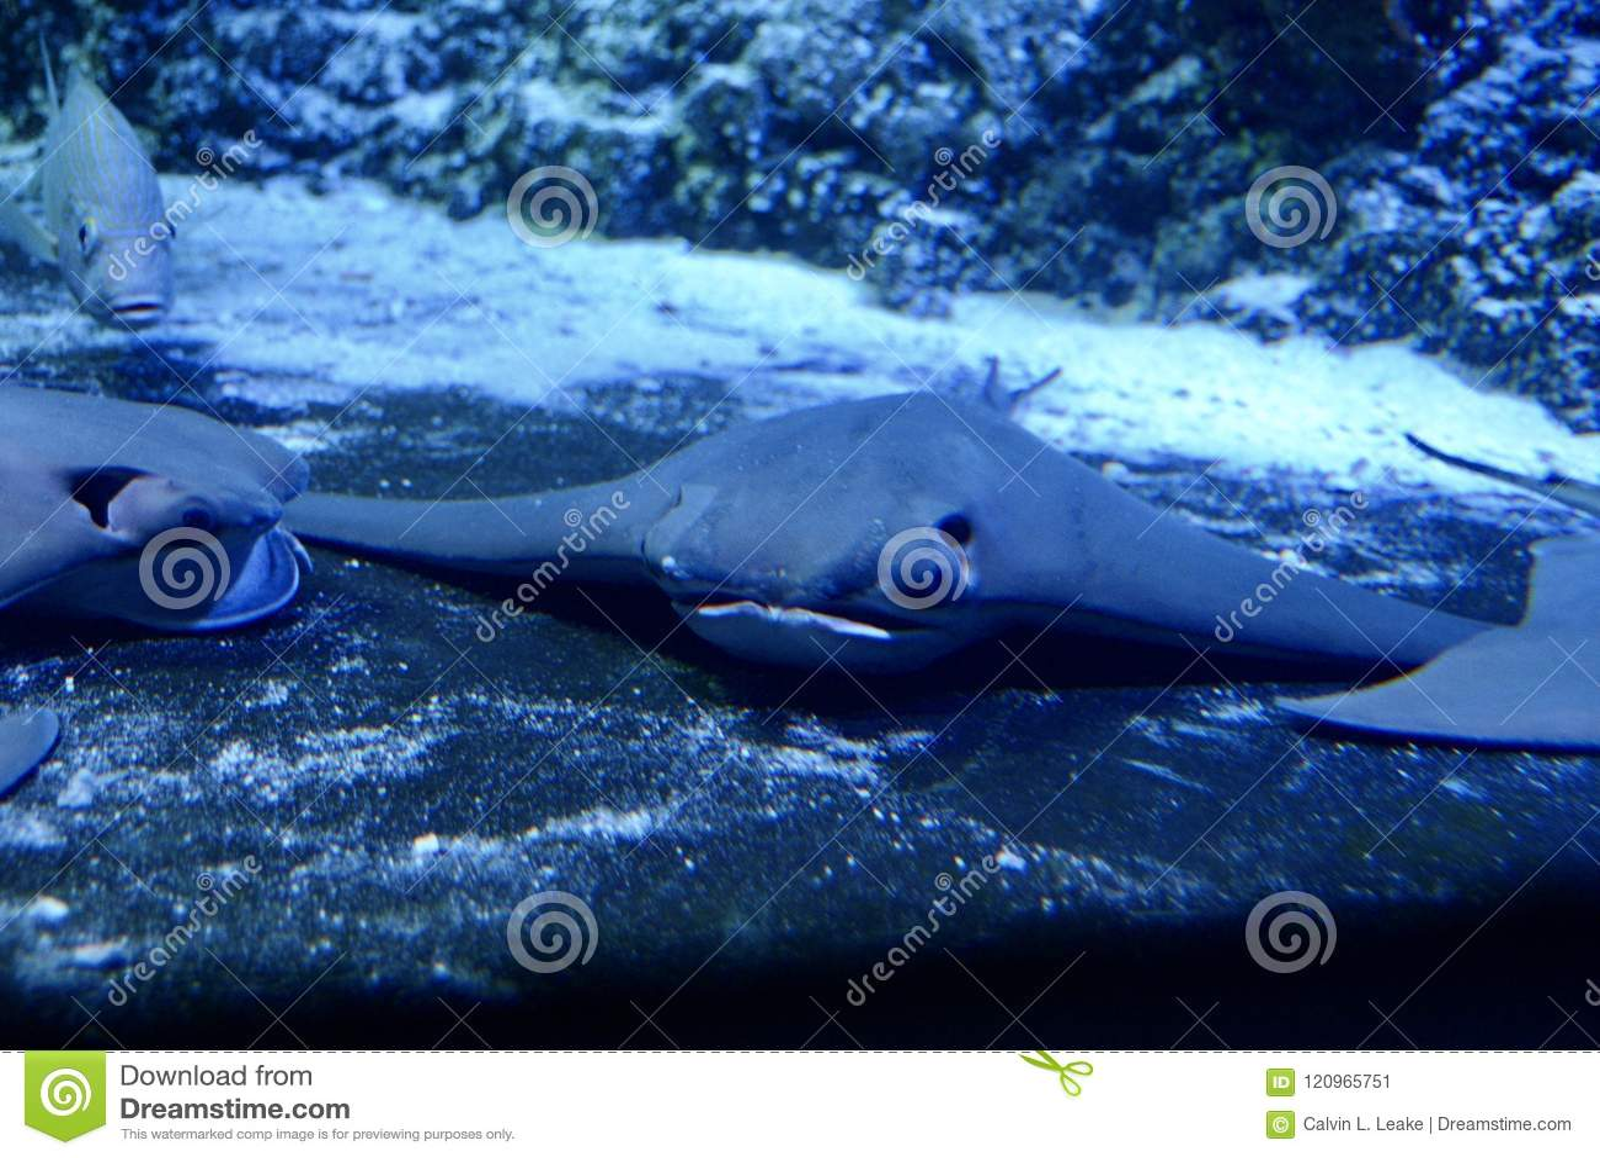 Stingray in the Ocean stock image  Image of aquatic - 120965751